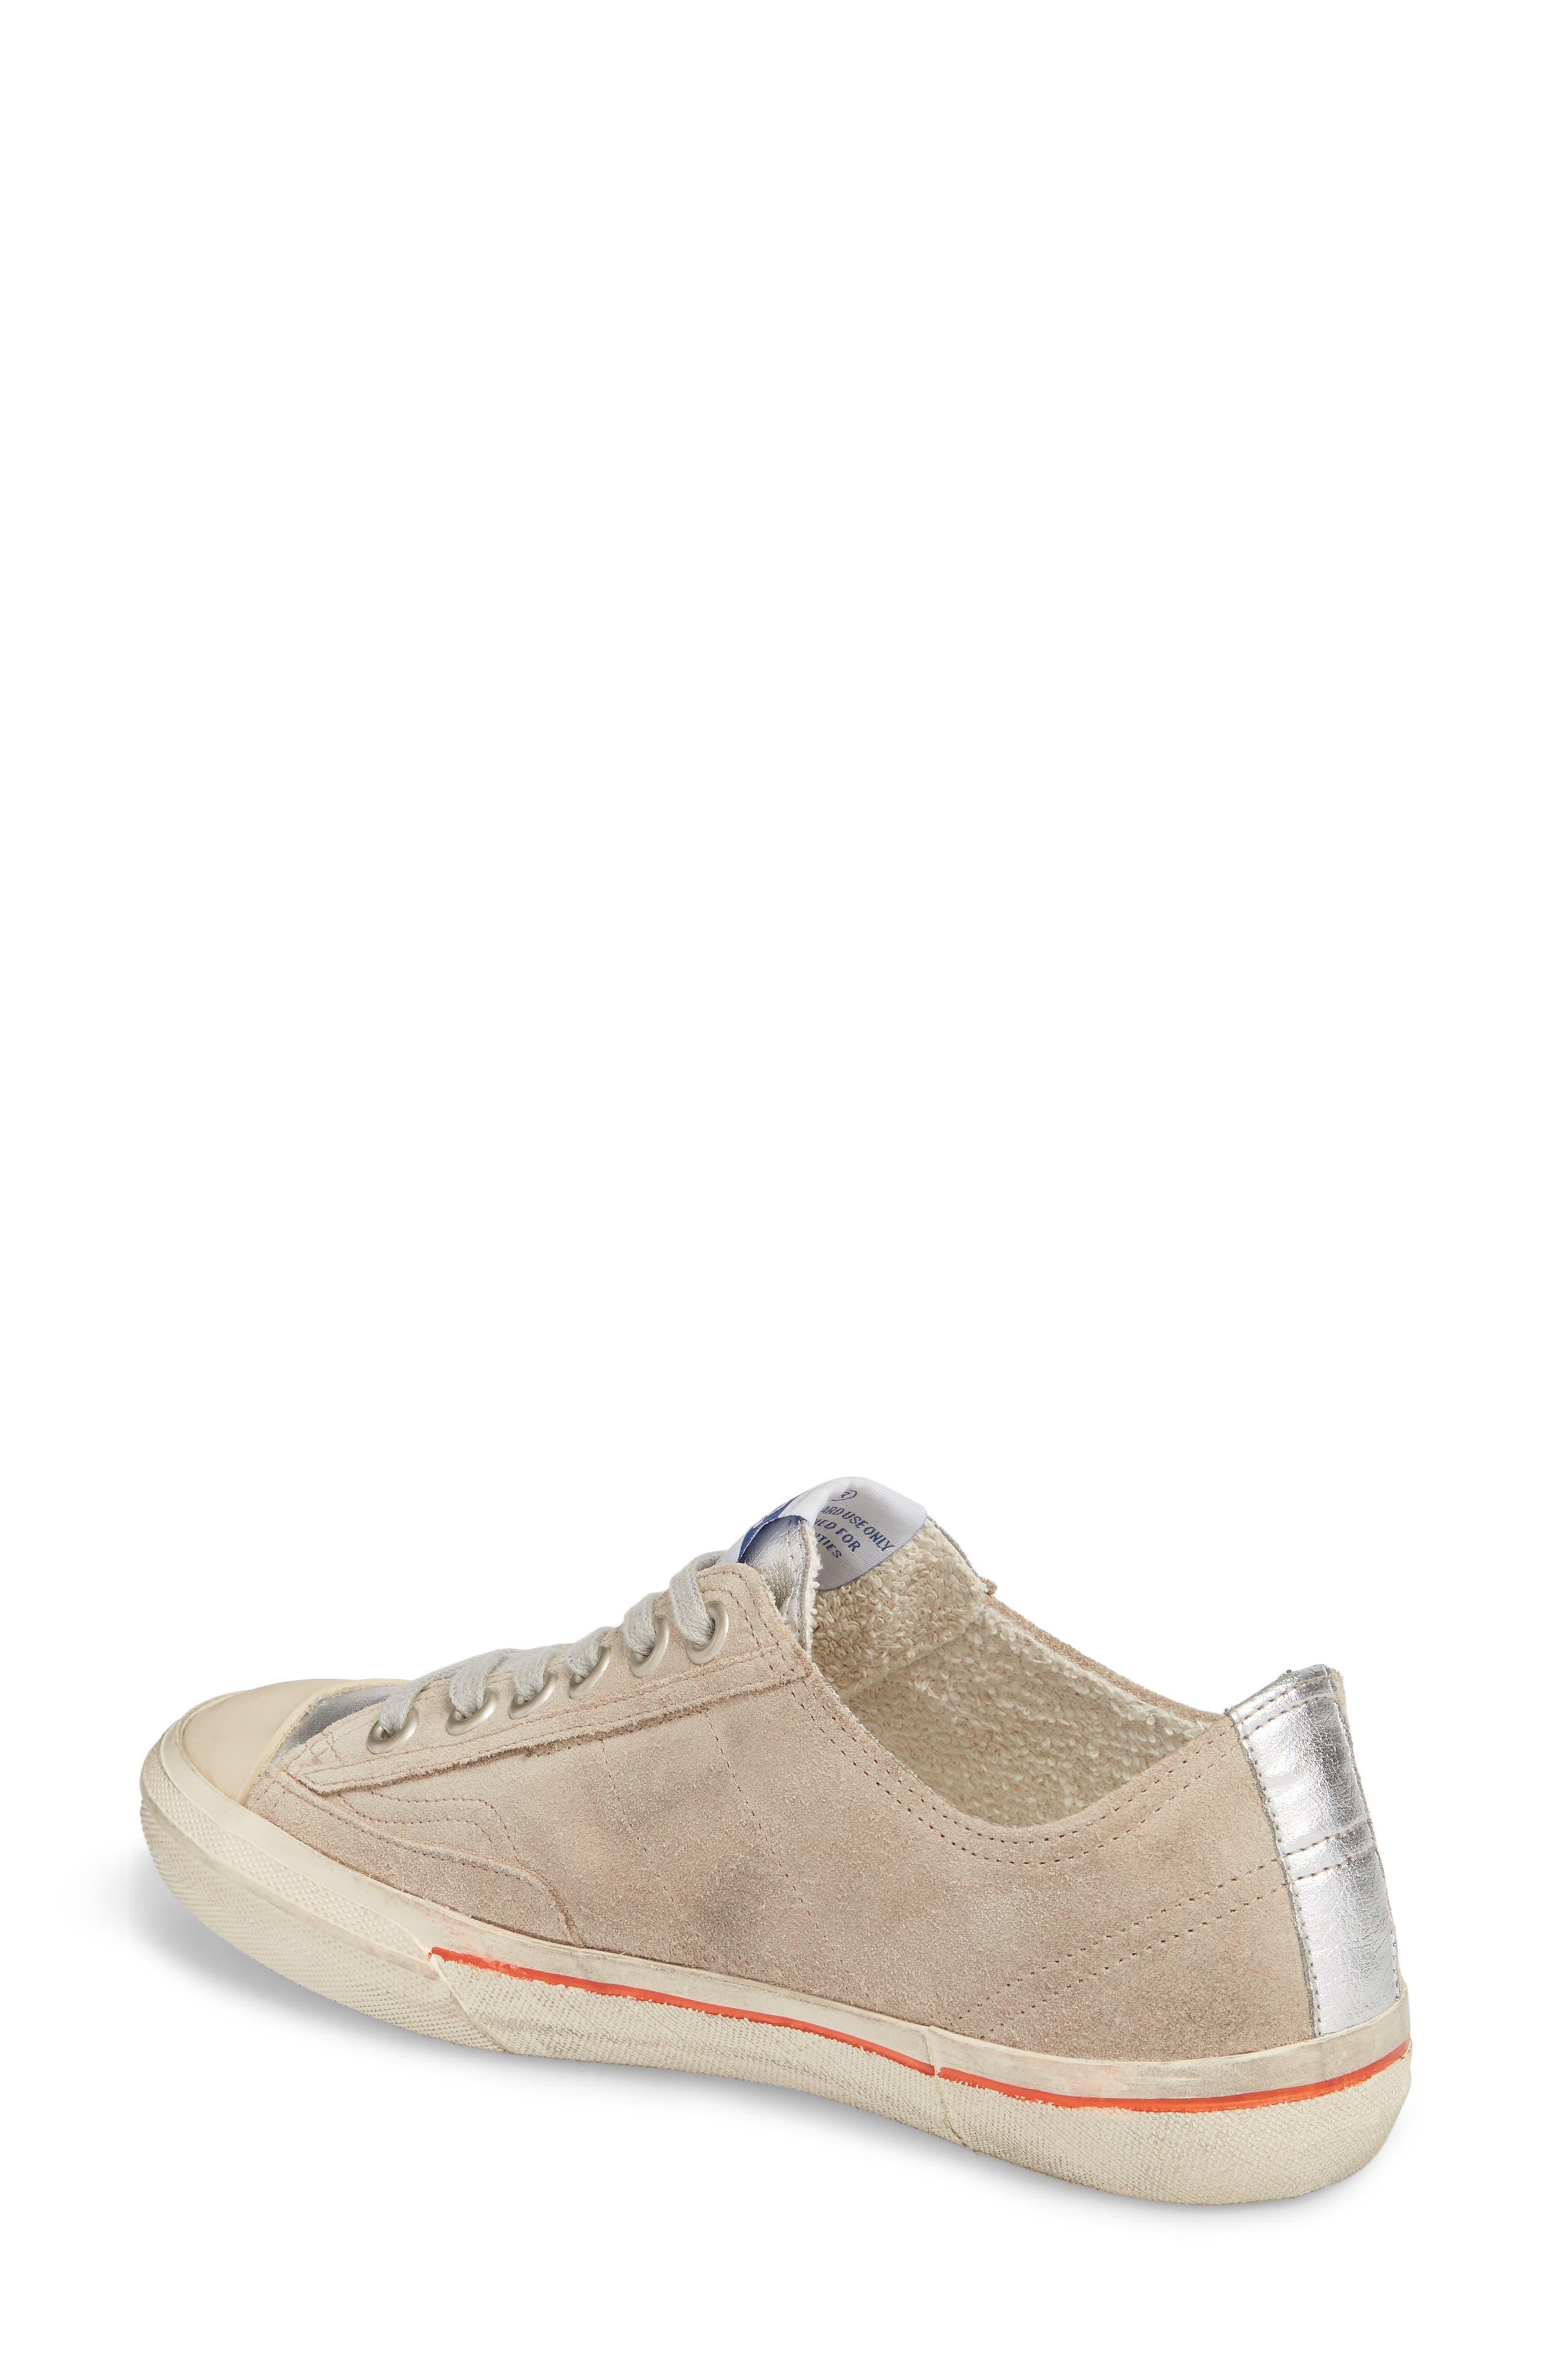 V-Star 2 Low Top Sneaker,                             Alternate thumbnail 2, color,                             020